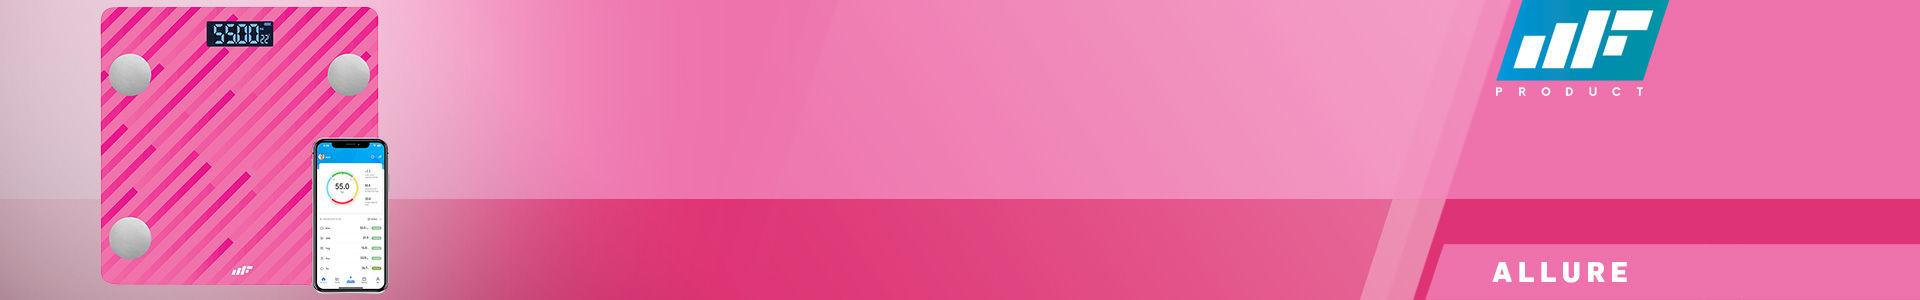 MF Product Allure 0532 Vücut Analizli Akıllı Tartı Pembe, en fiyata stokta!